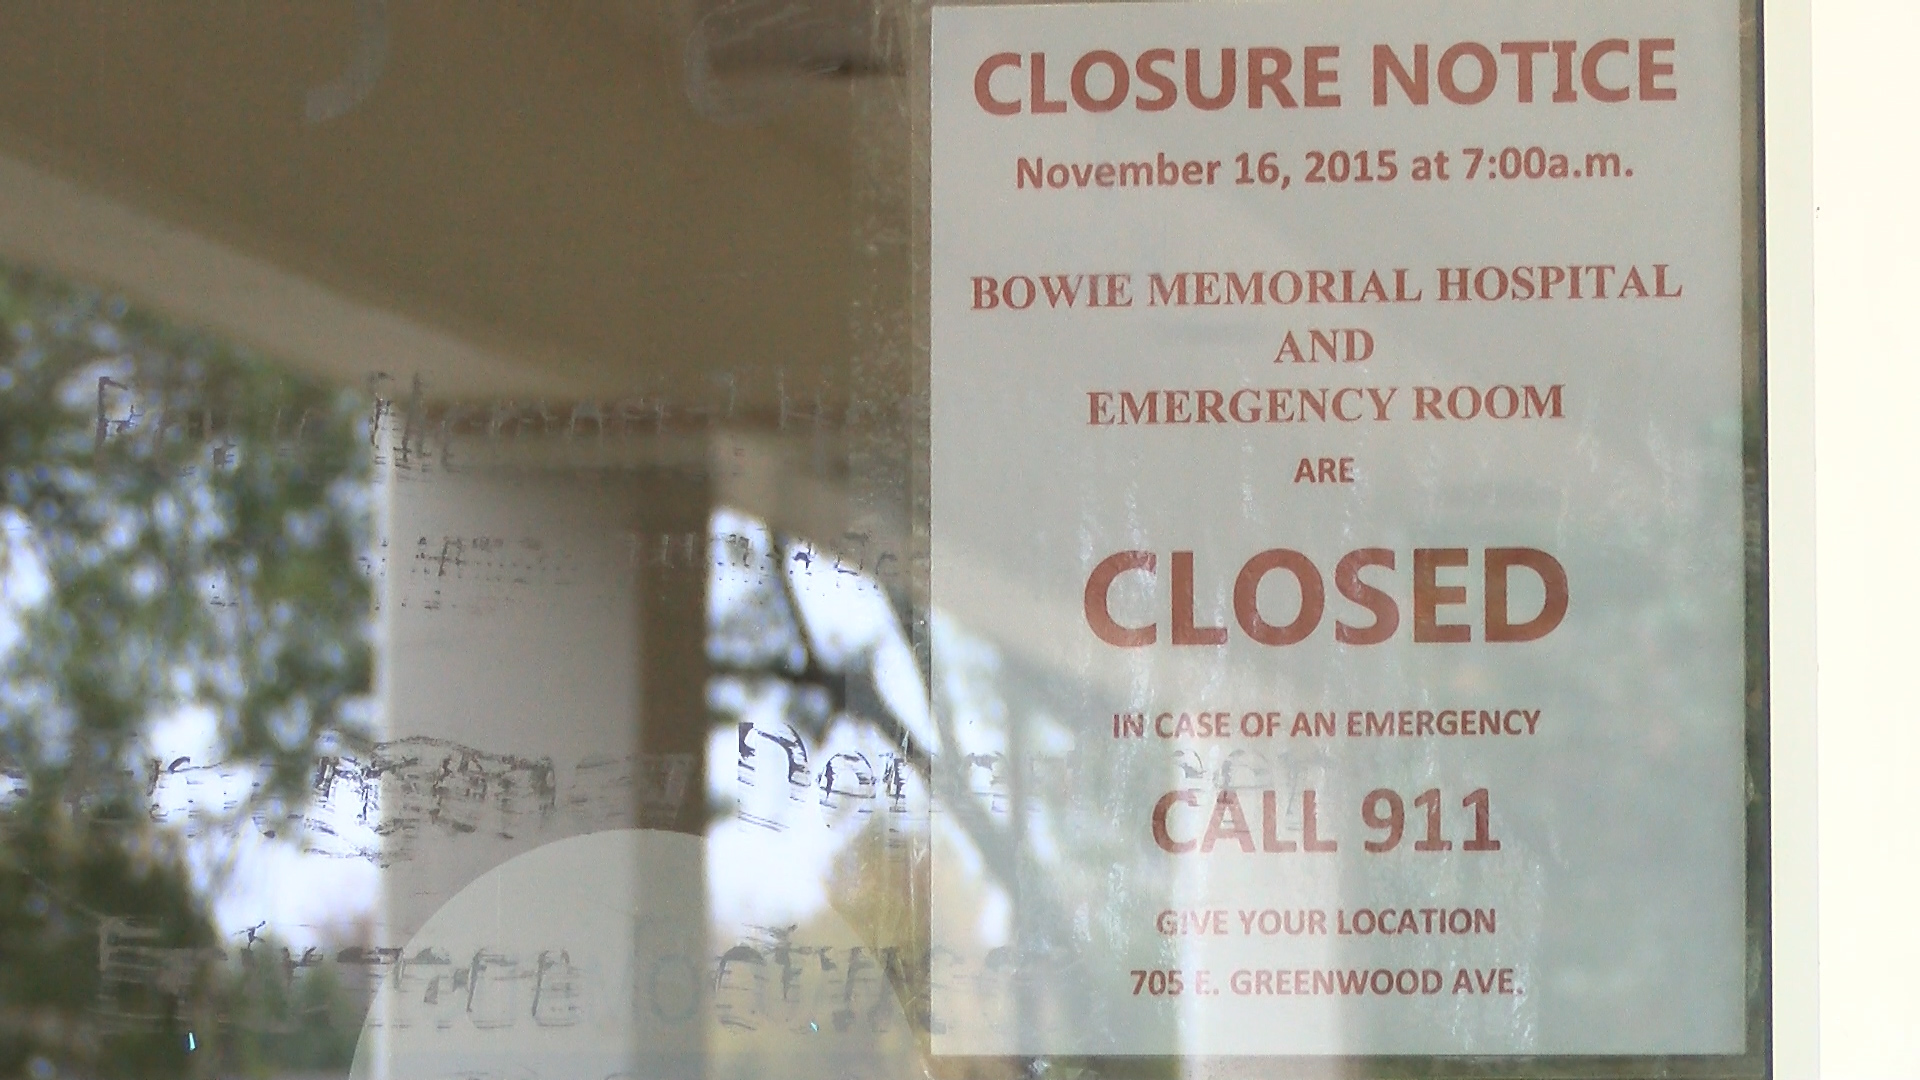 bowie hospital closed_1447710184451.jpg